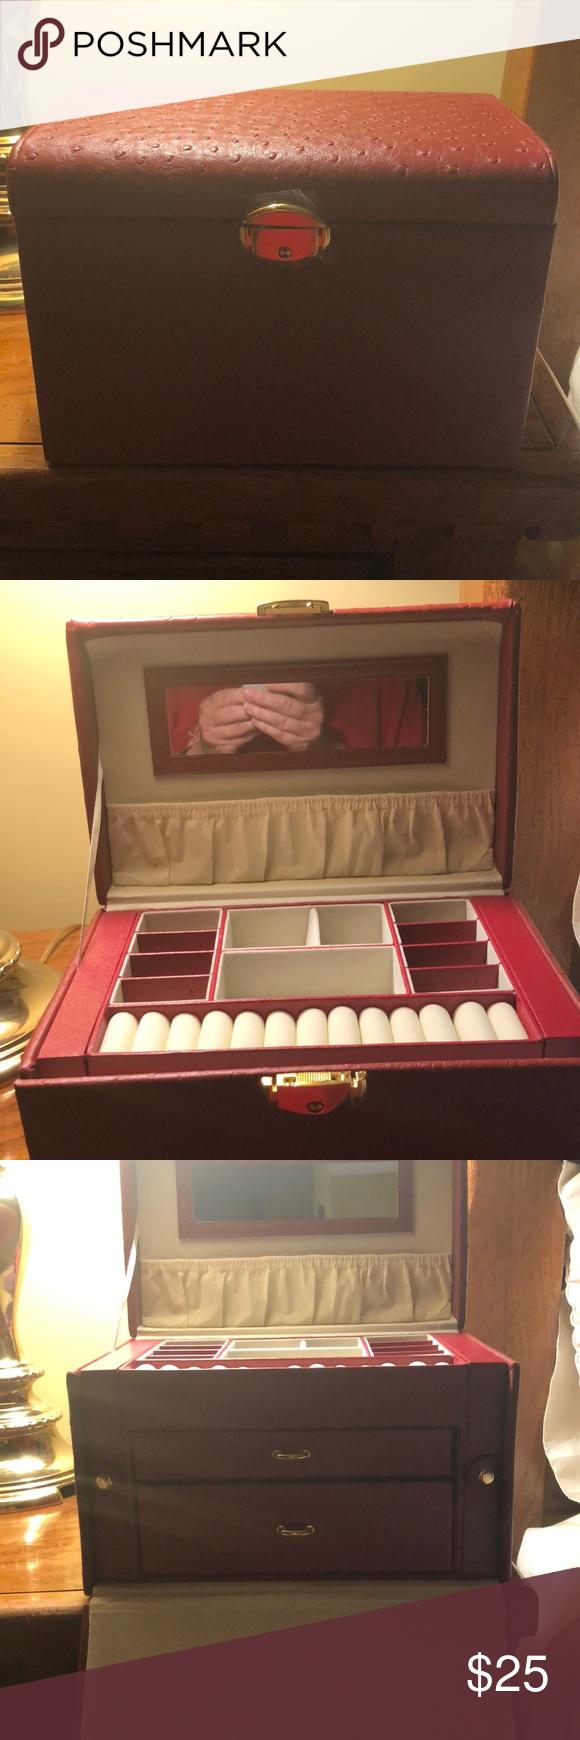 Red Brown Leather Jared Jewelry Box Jared Jewelry Leather Jewelry Box Jewelry Box